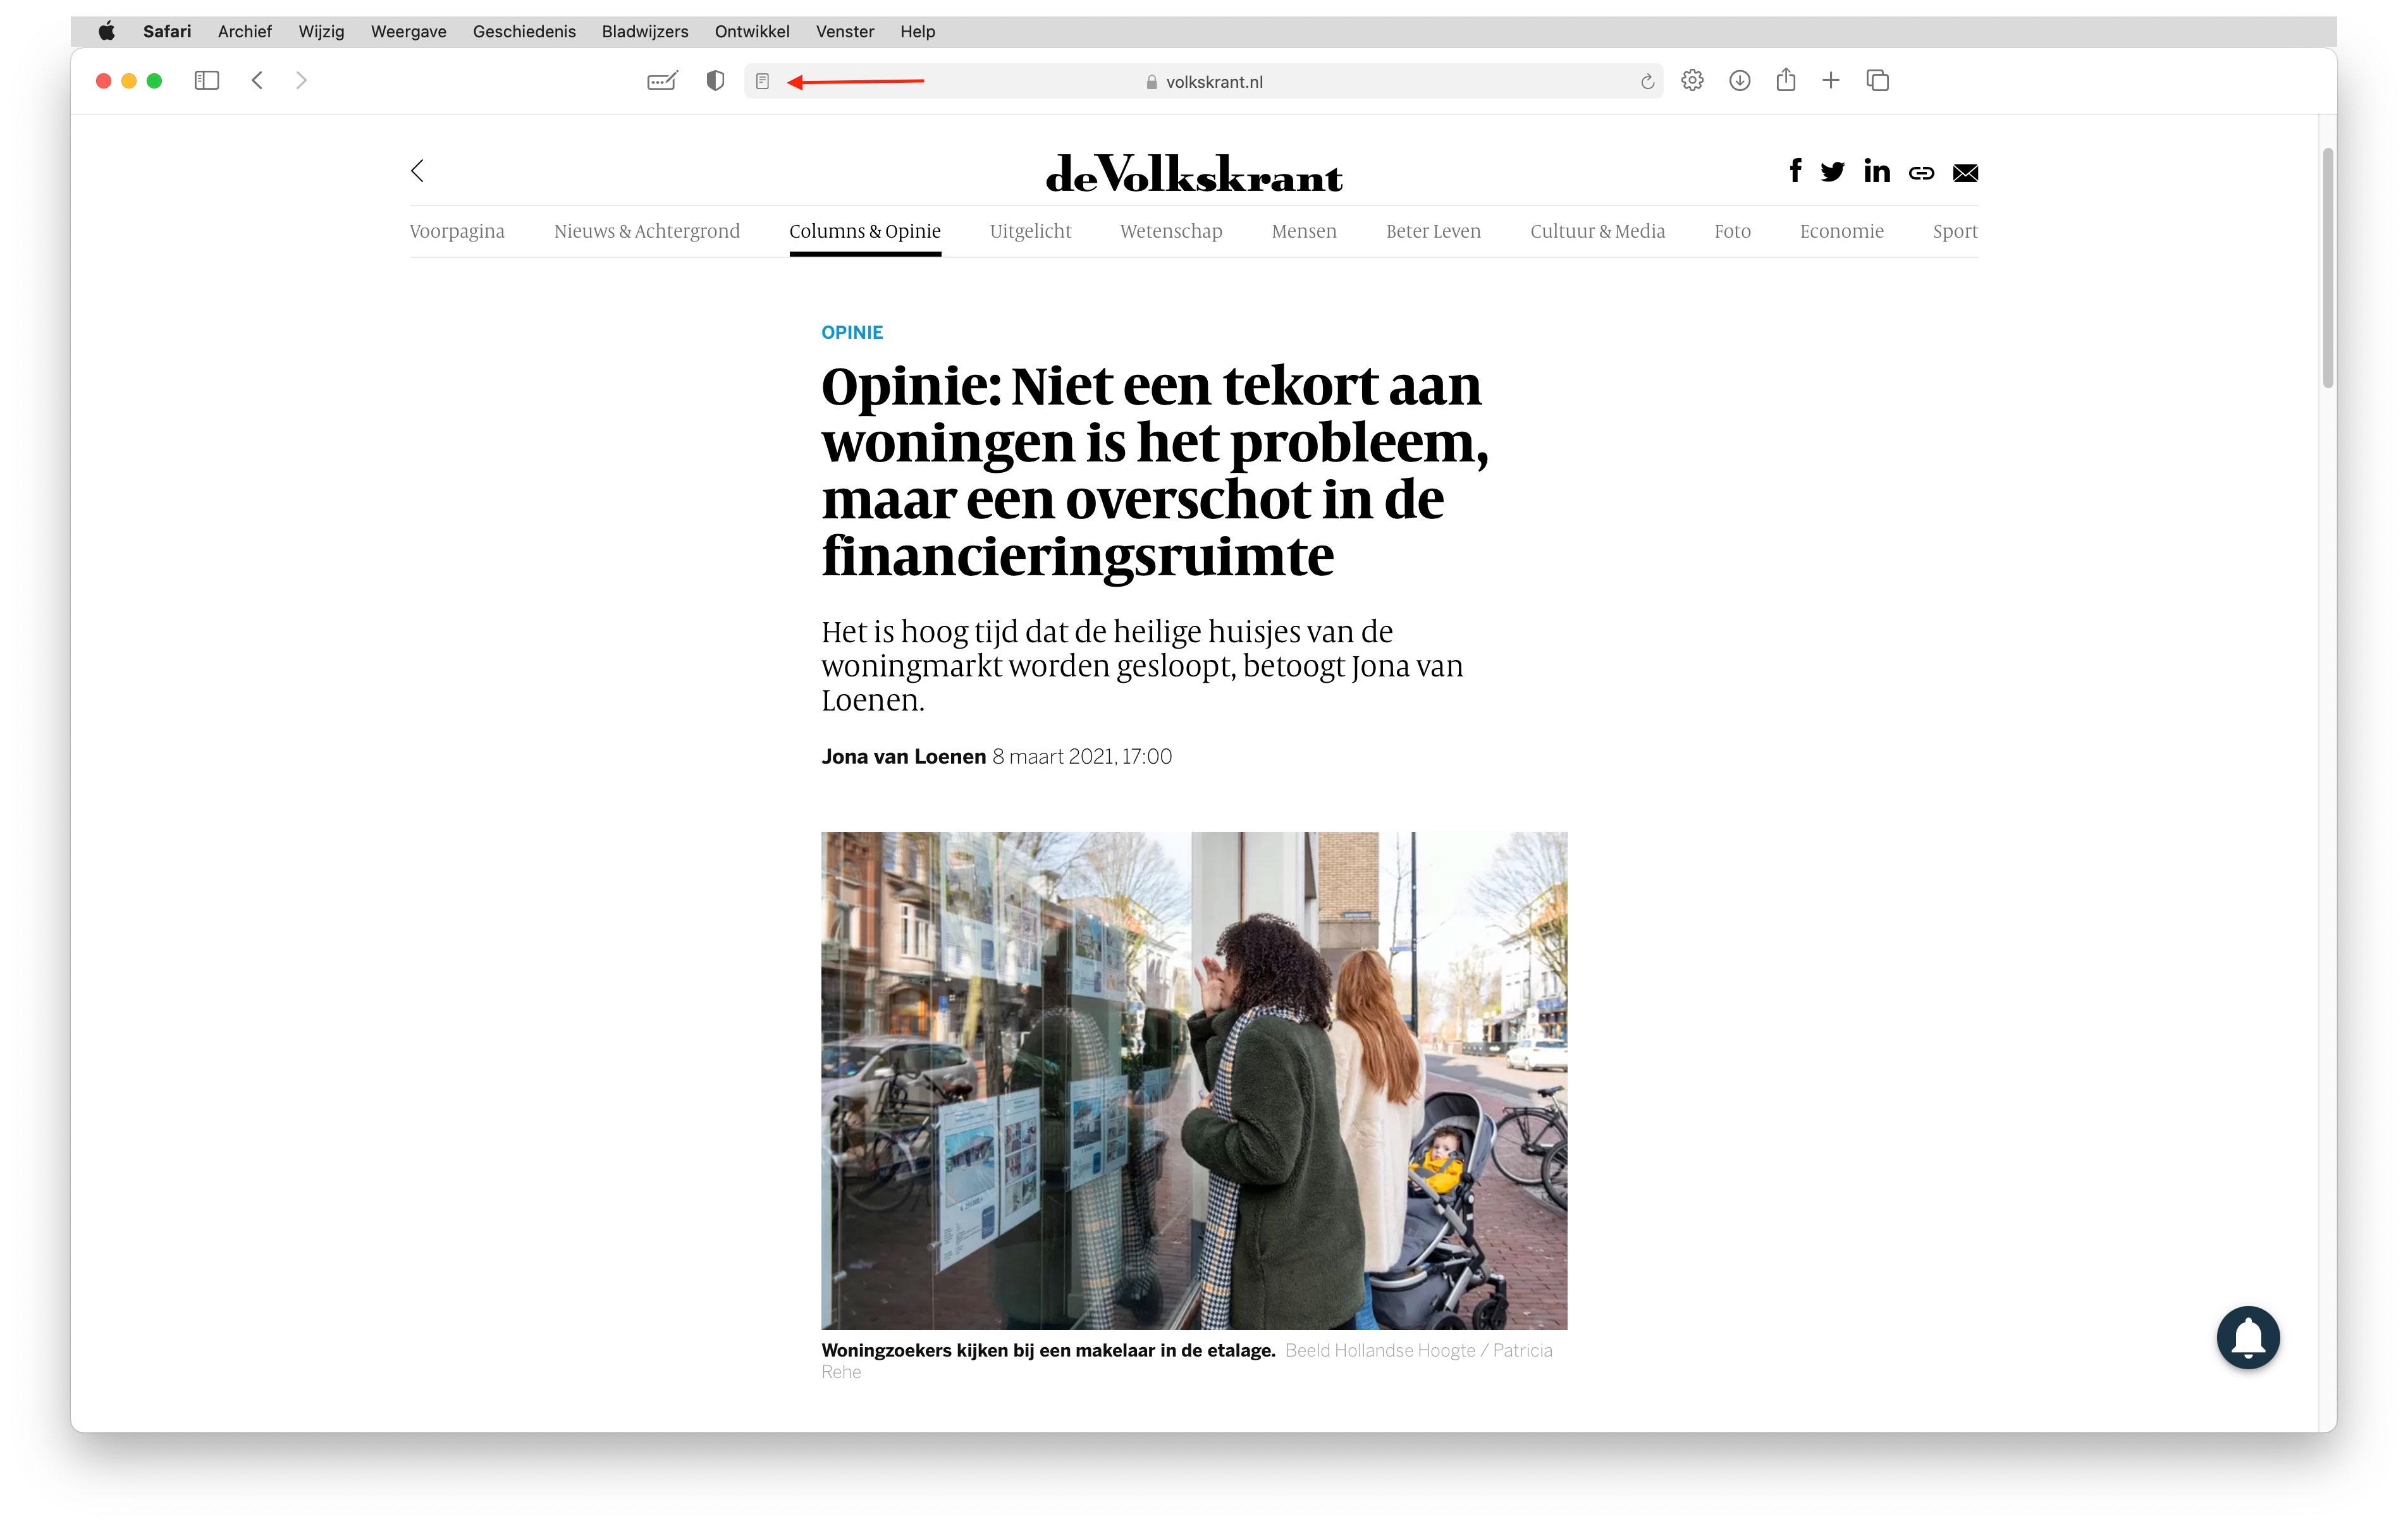 https://www.macfreak.nl/modules/news/images/zArt.SafariBigSurReaderWeergave-1.jpg